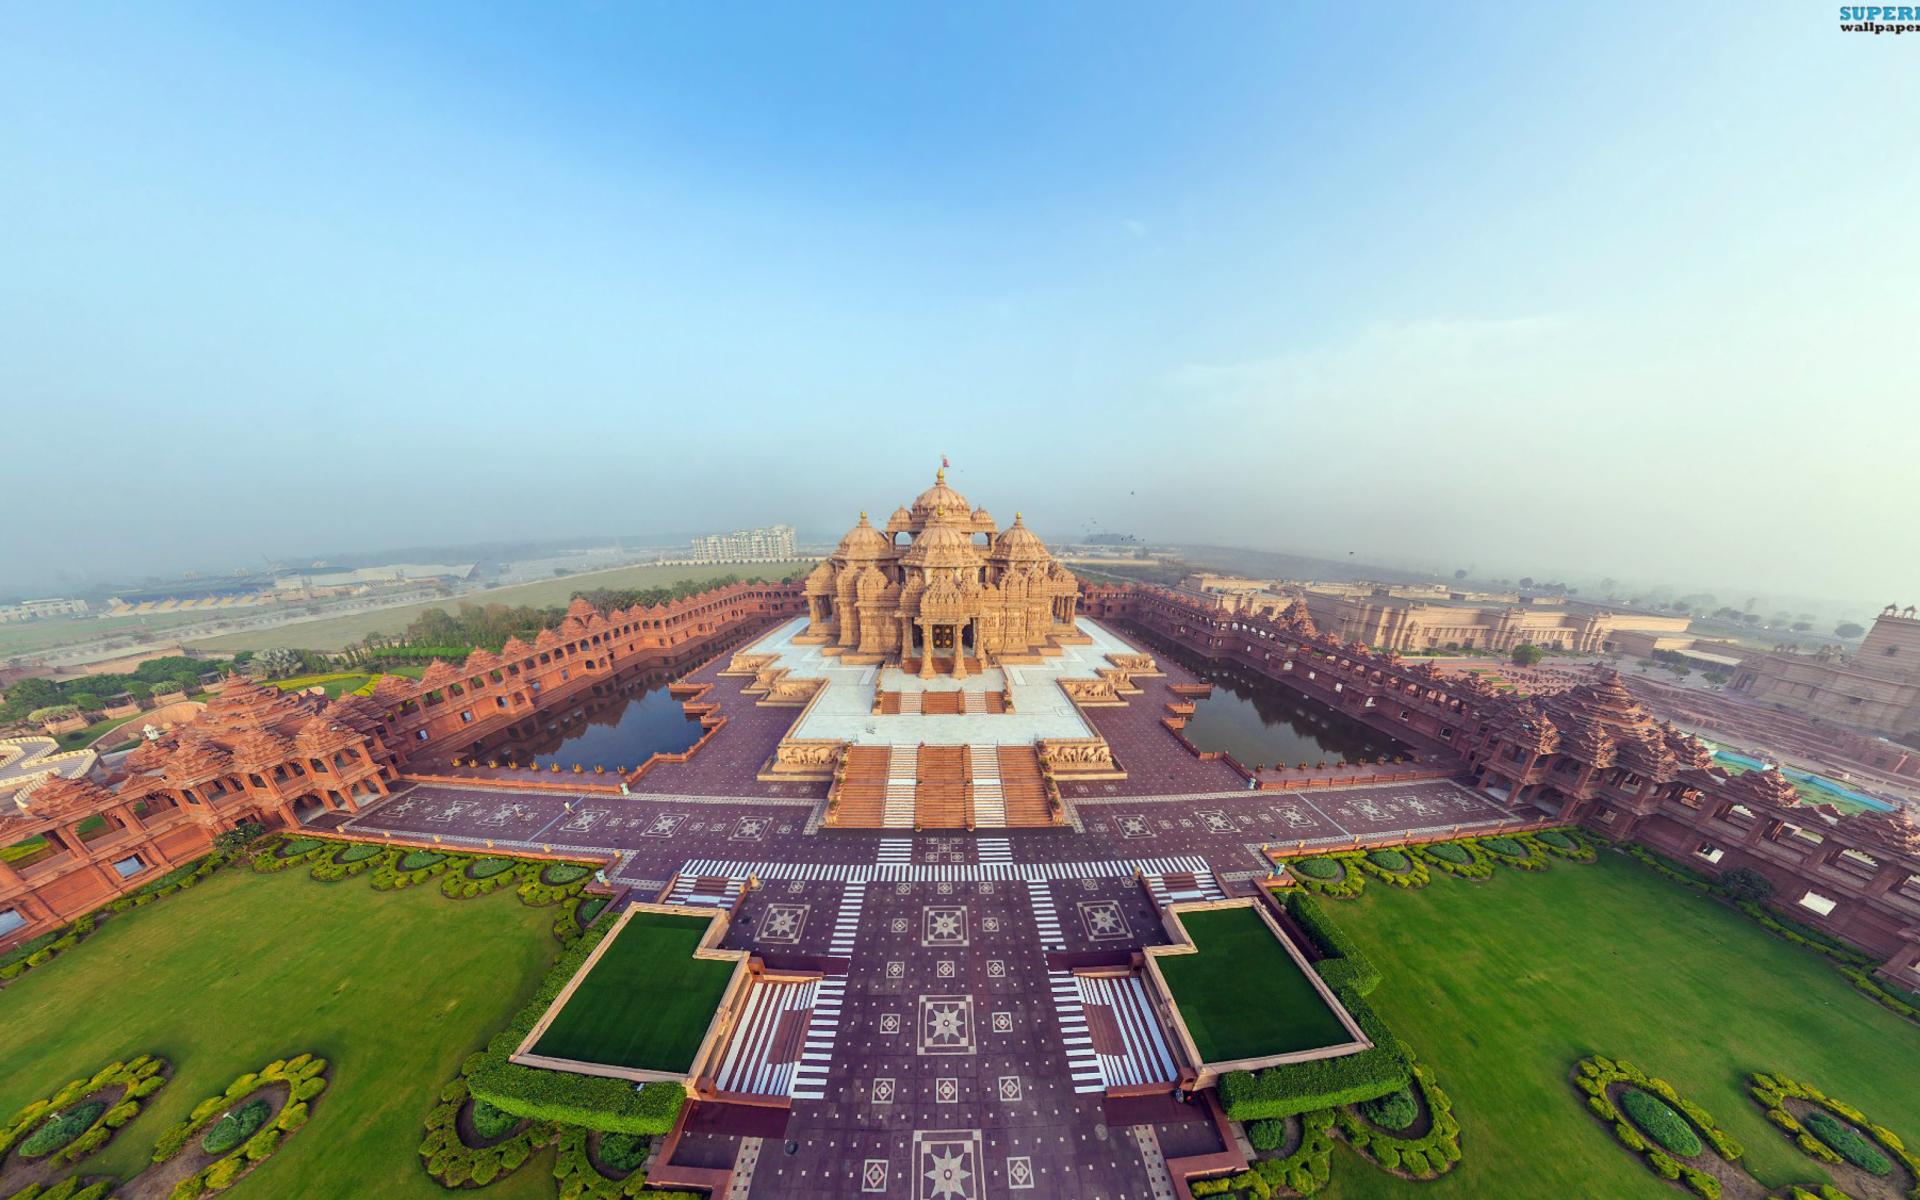 Akshardham Delhi India para Widescreen Desktop PC 1920x1080 Full HD